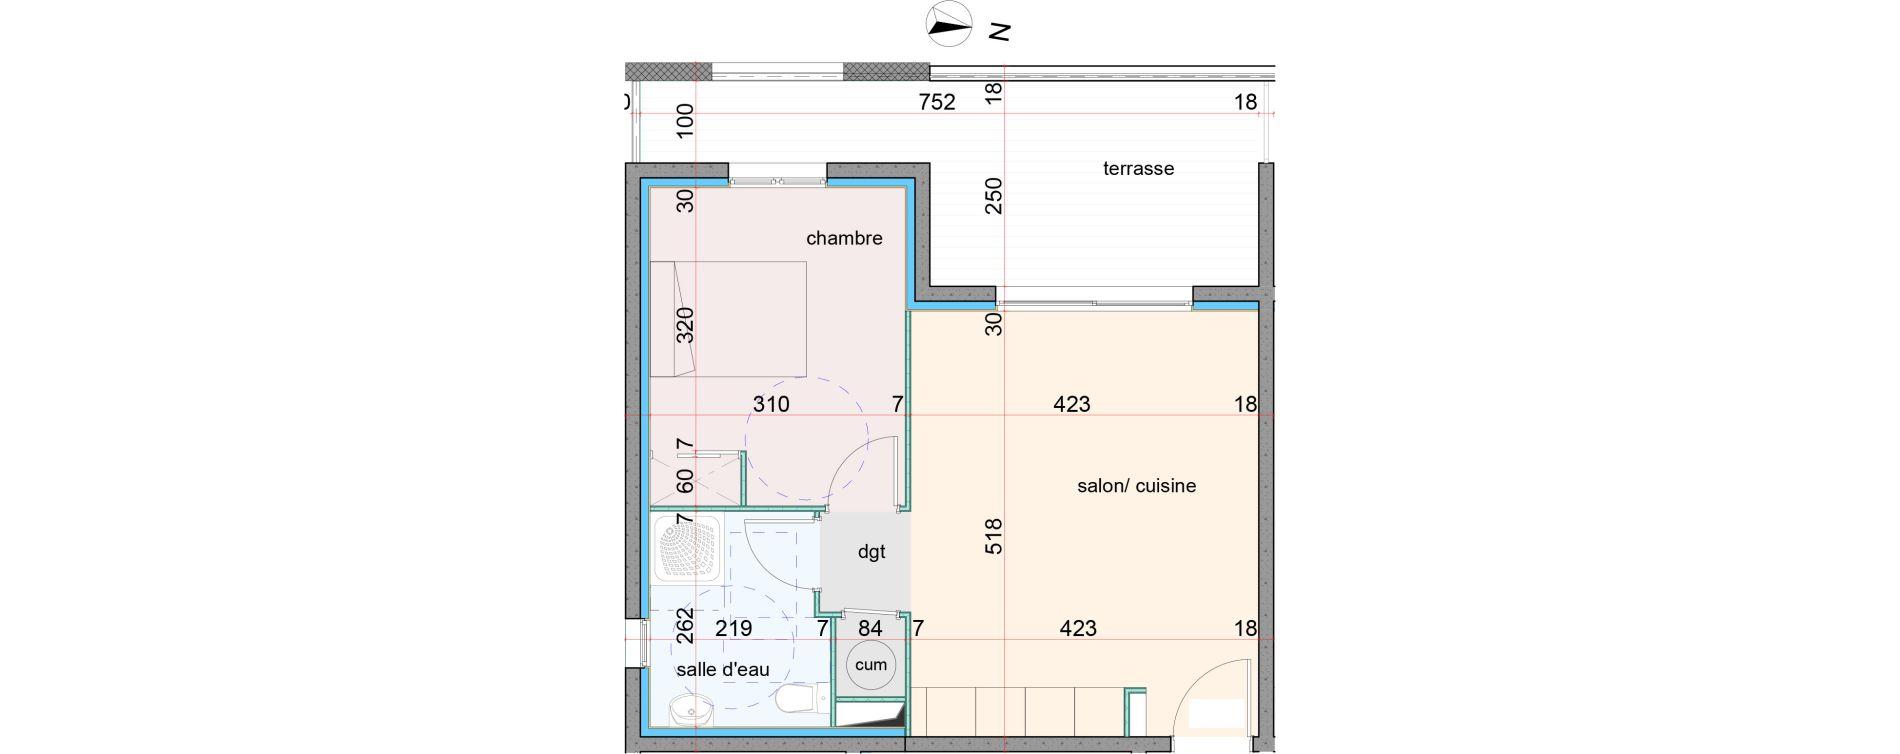 Appartement T2 de 41,50 m2 à Penta-Di-Casinca Centre